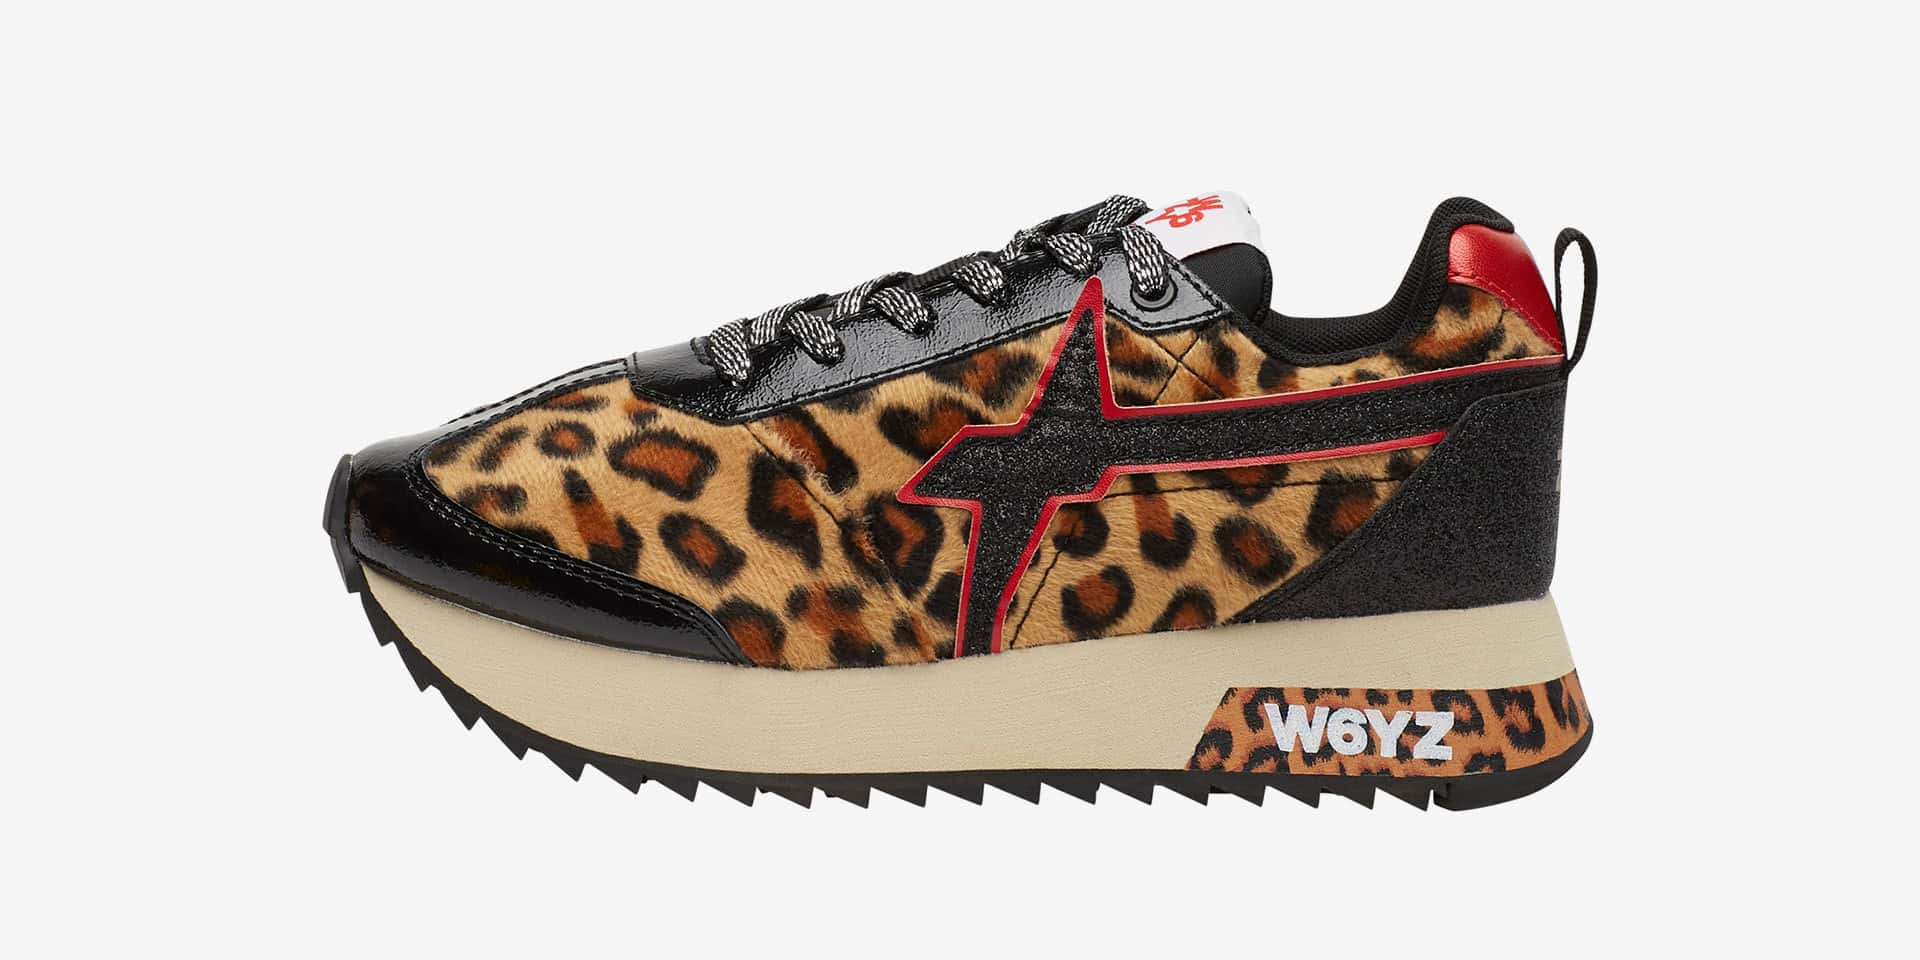 KIS-W. - Sneakers in pelle e tessuto - Nero/Leopardo